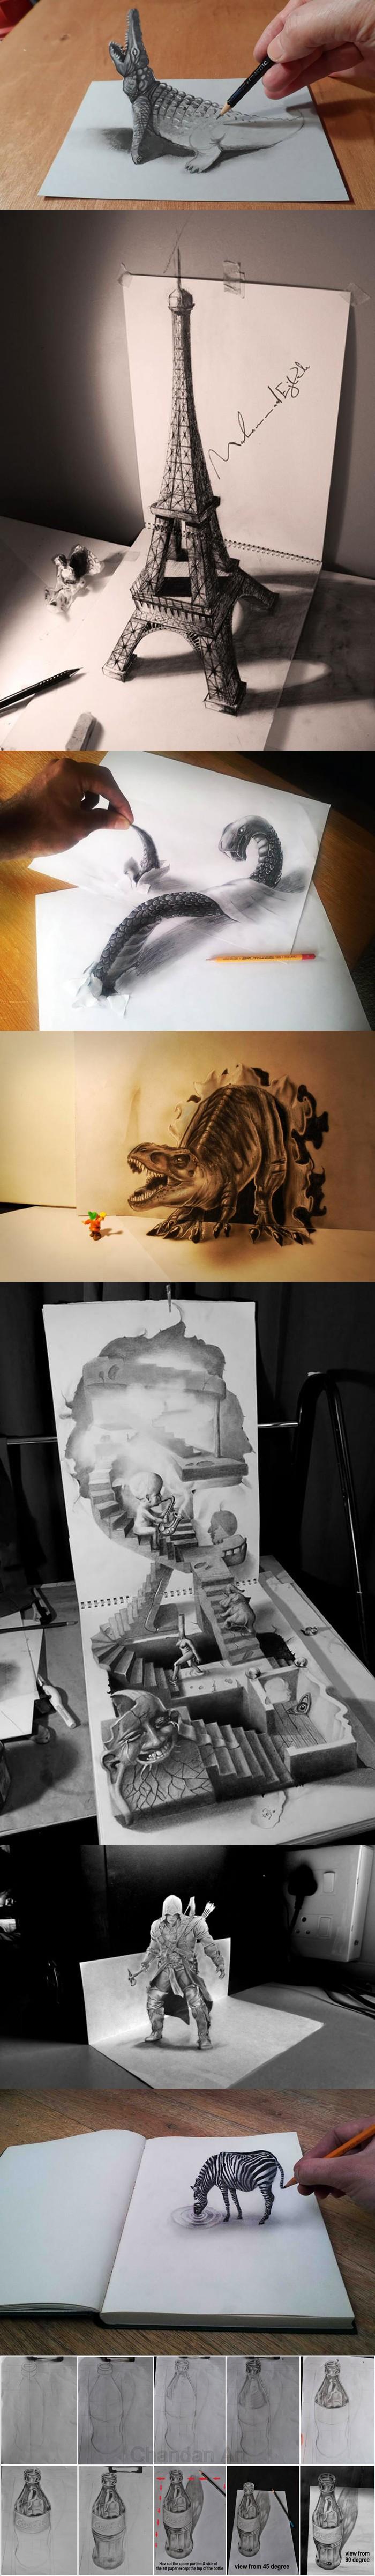 8 Stunning 3D Pencil Drawings